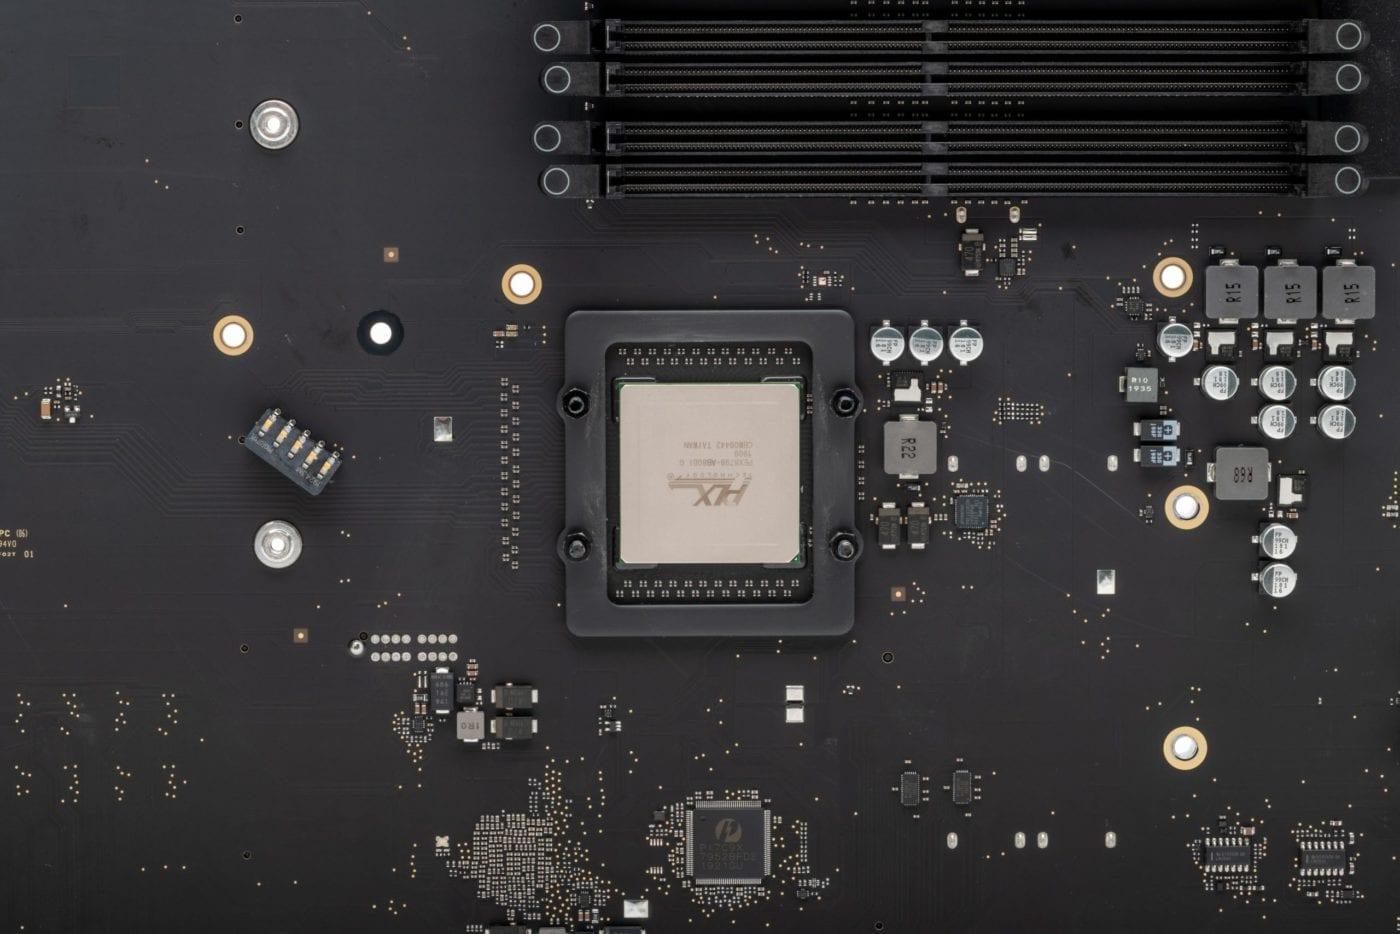 2019 Mac Pro – PLX chip with heatsink removed